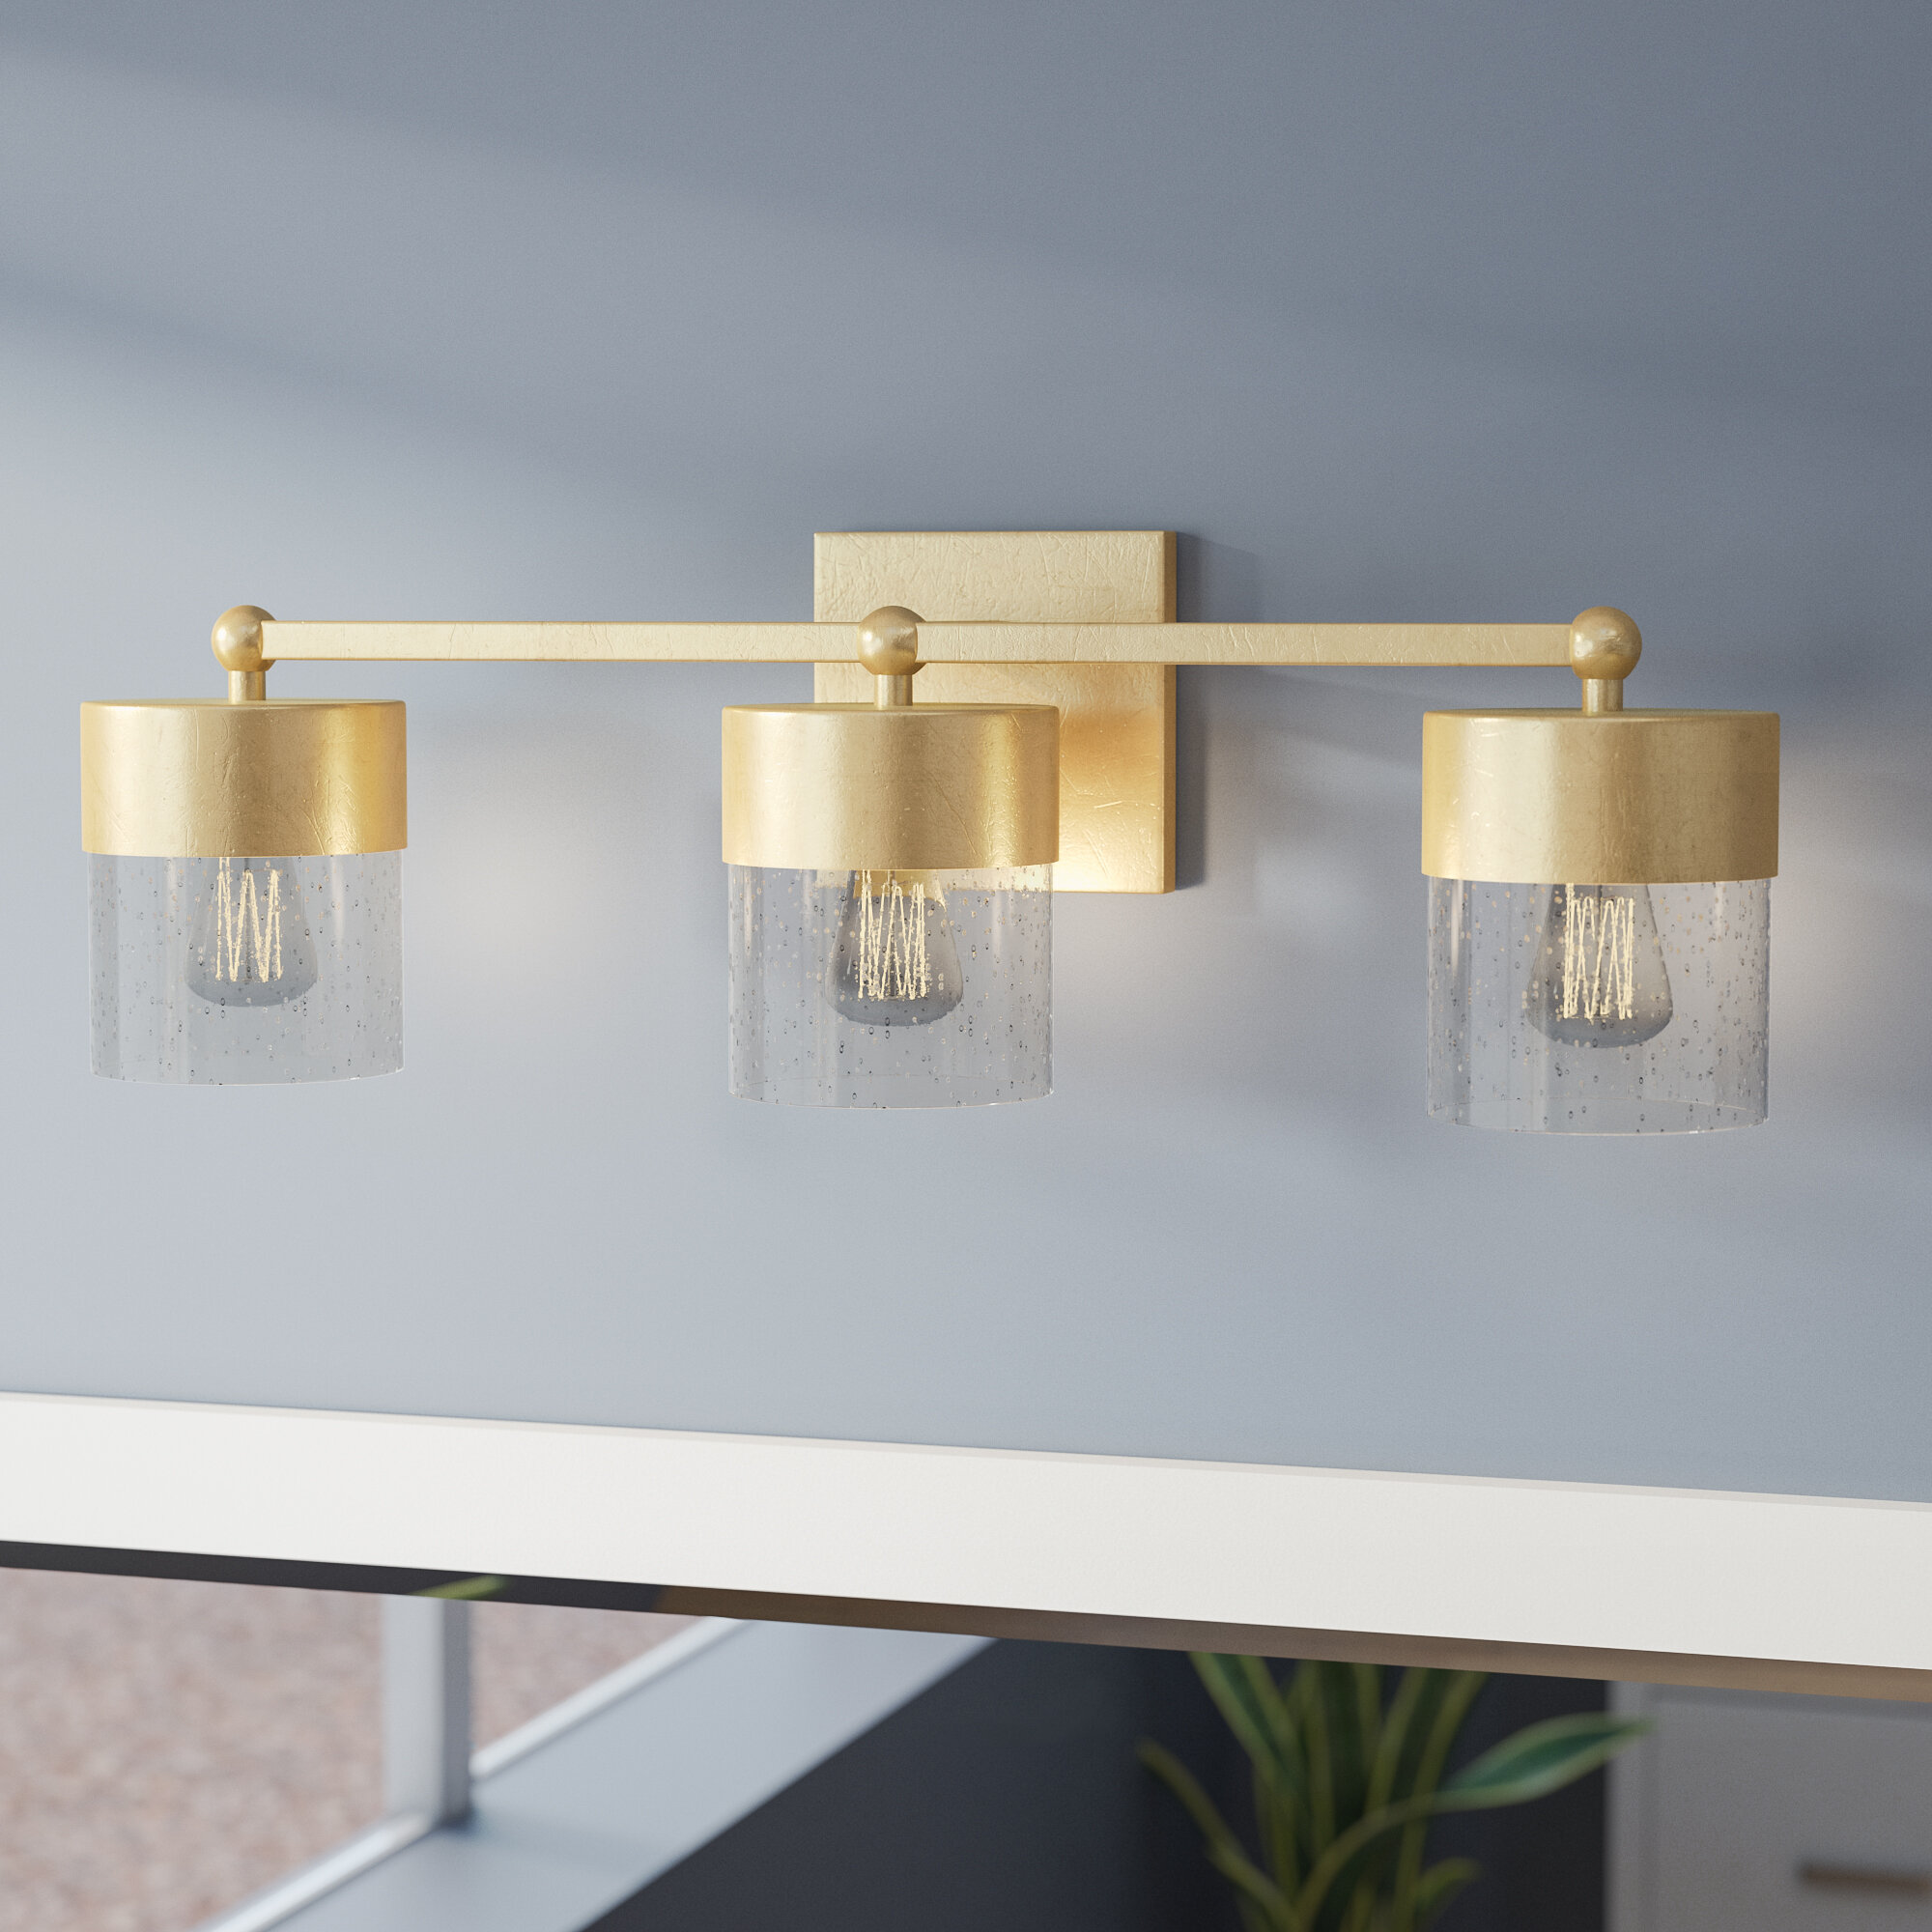 Commercial Use Gold Bathroom Vanity Lighting You Ll Love In 2021 Wayfair